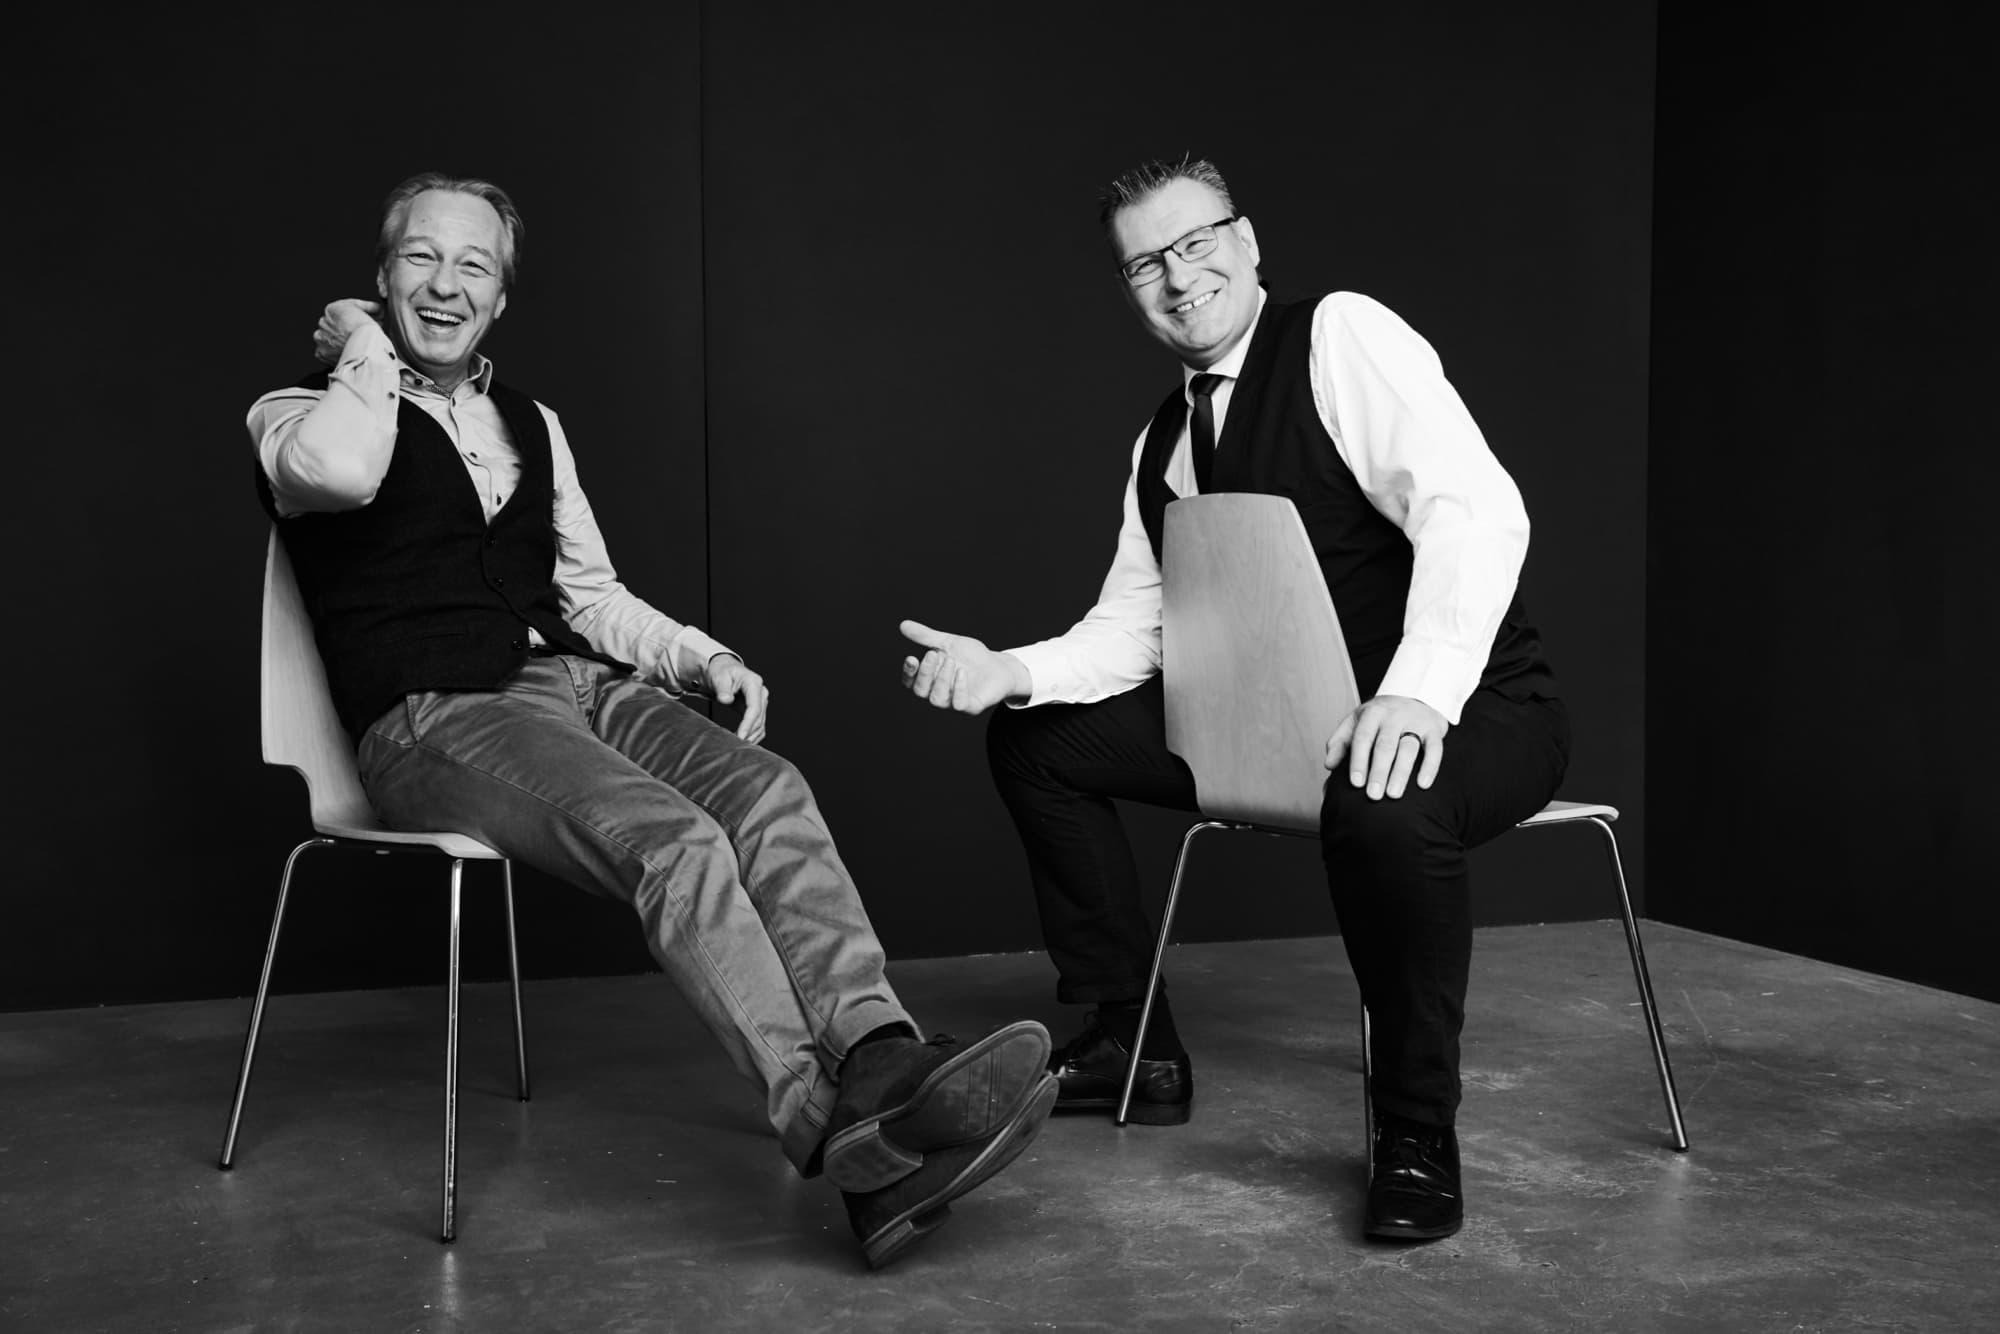 Guarda Val | Ralph Treuthardt | Magazin Zürich